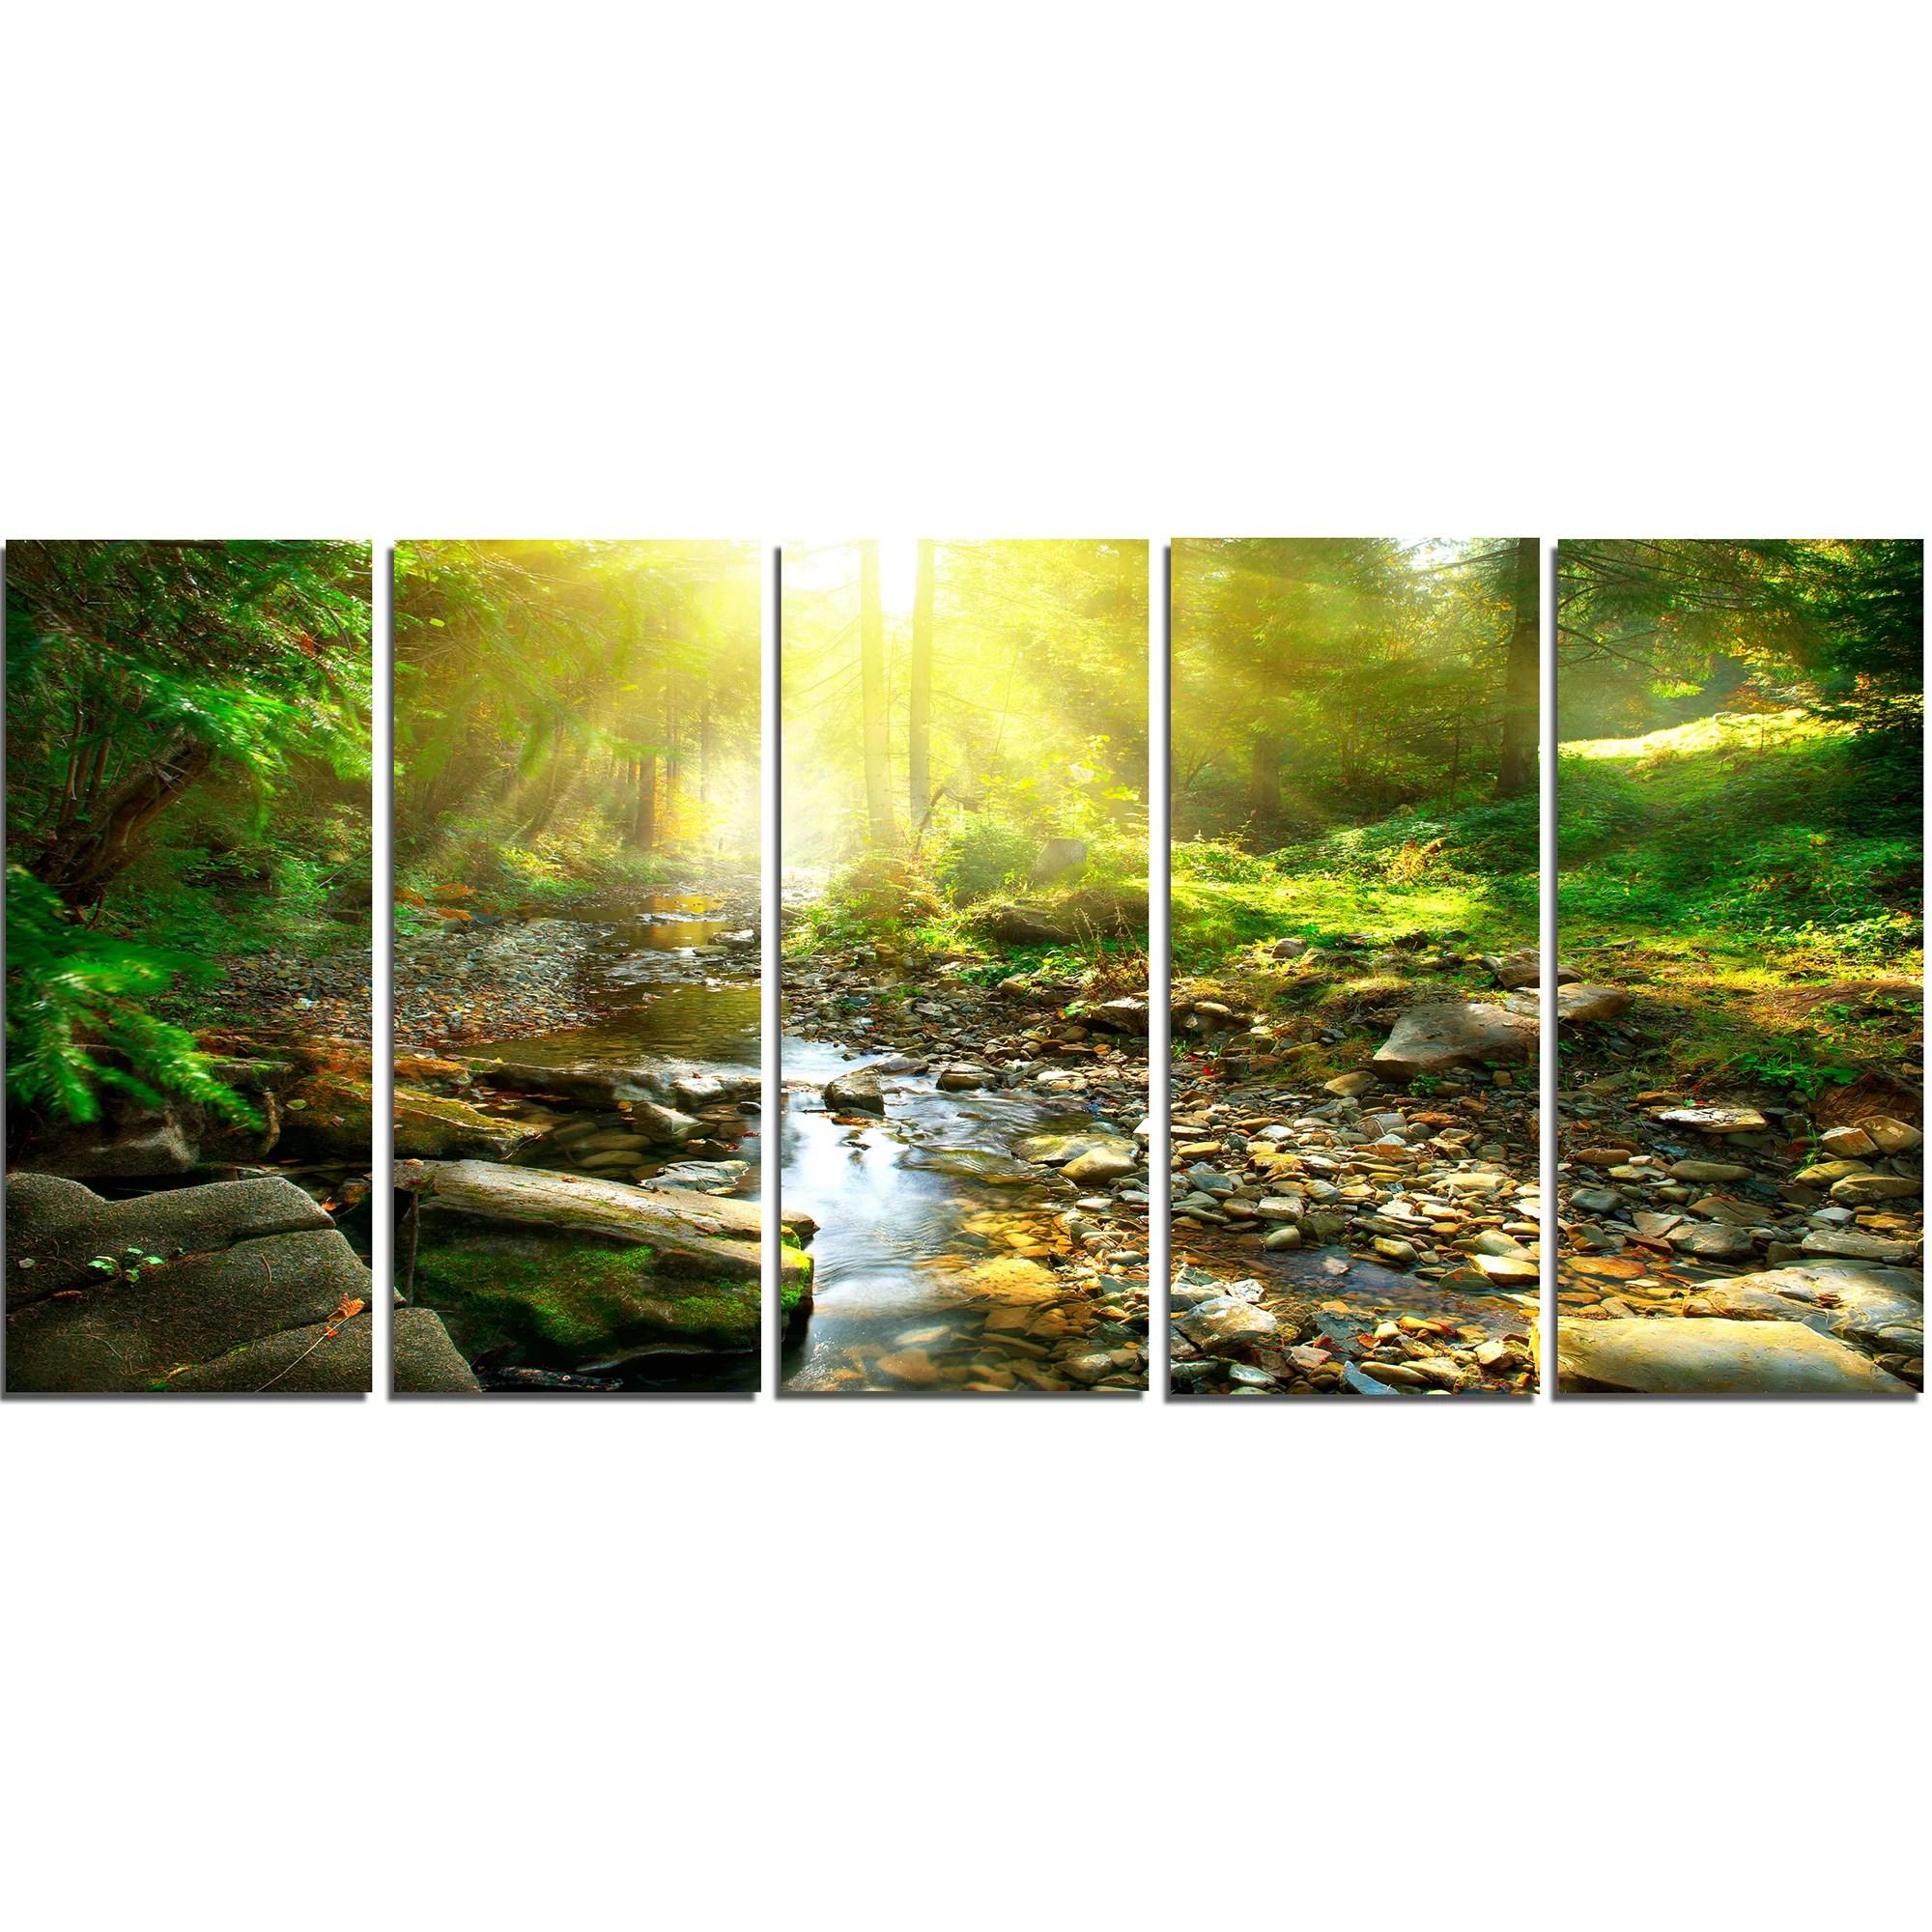 DesignArt Mountain Stream in Forest 5 Piece Wall Art on